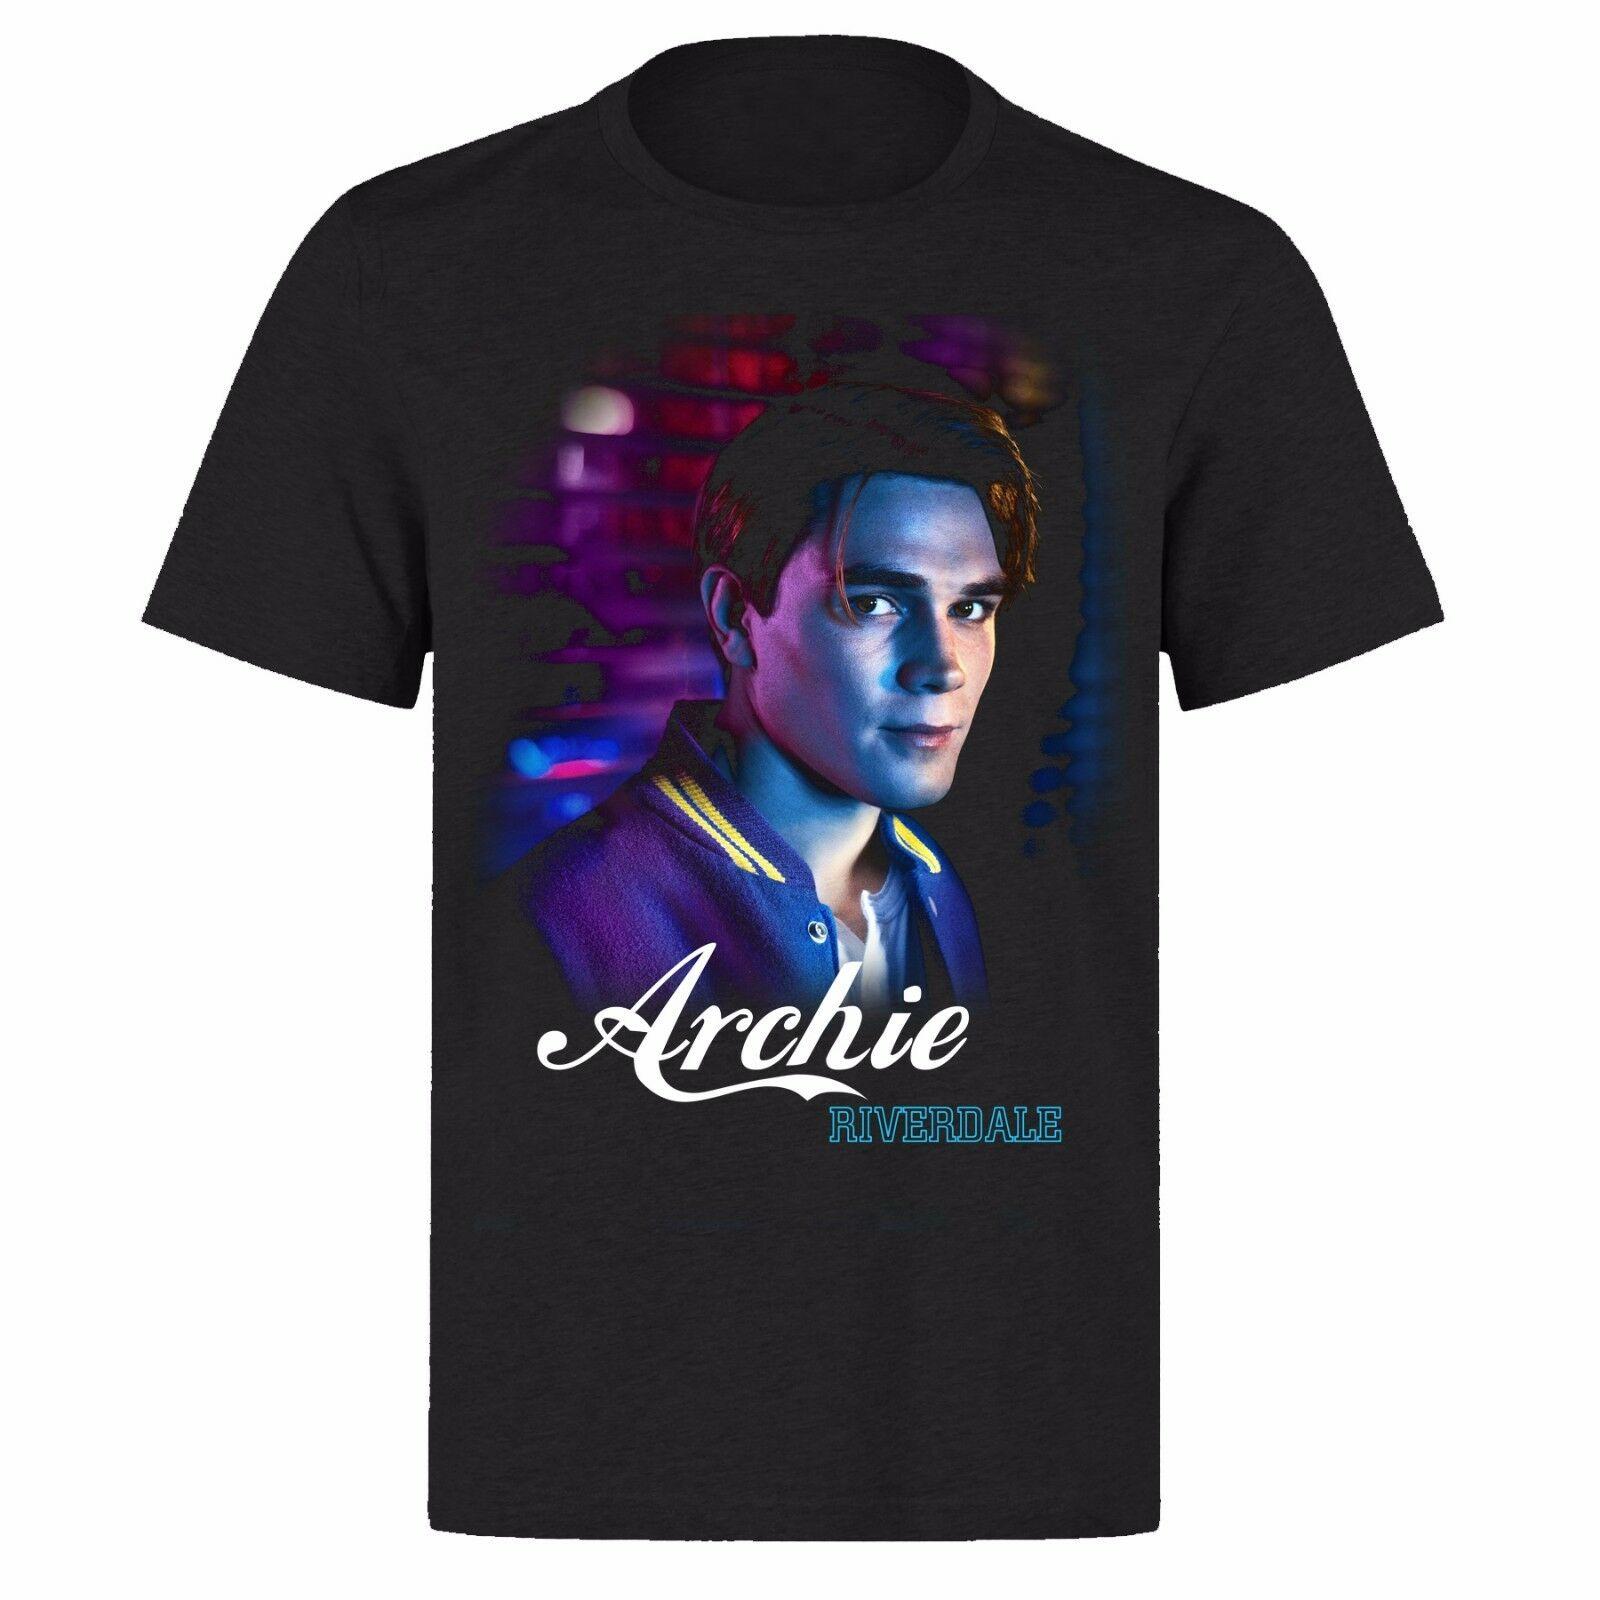 ARCHIE ANDREWS RIVERDALE K.J APA PH156 NETFLIX camiseta negra UNISEX